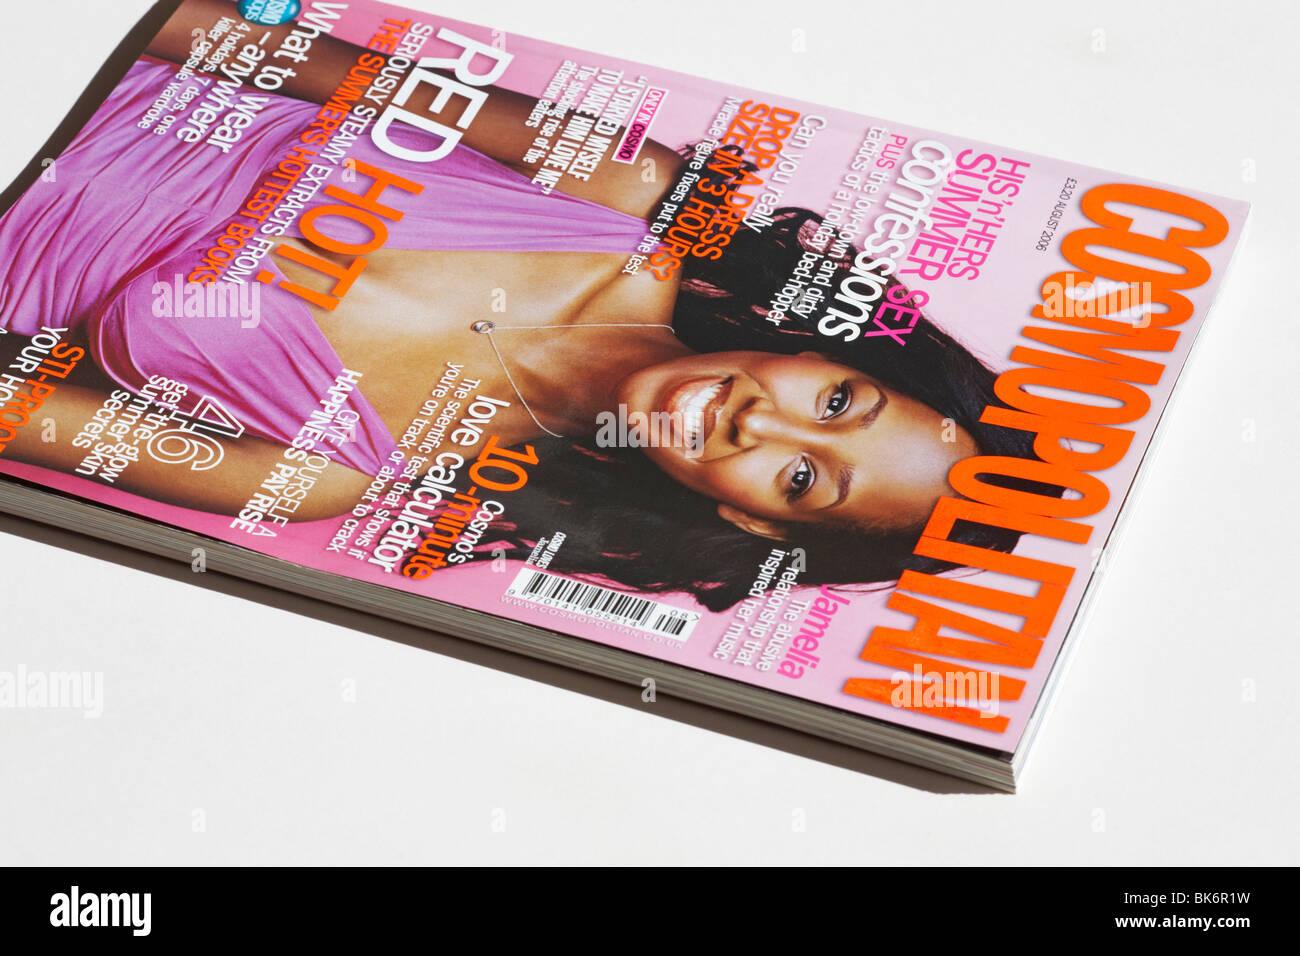 Cosmopolitan magazine - Stock Image